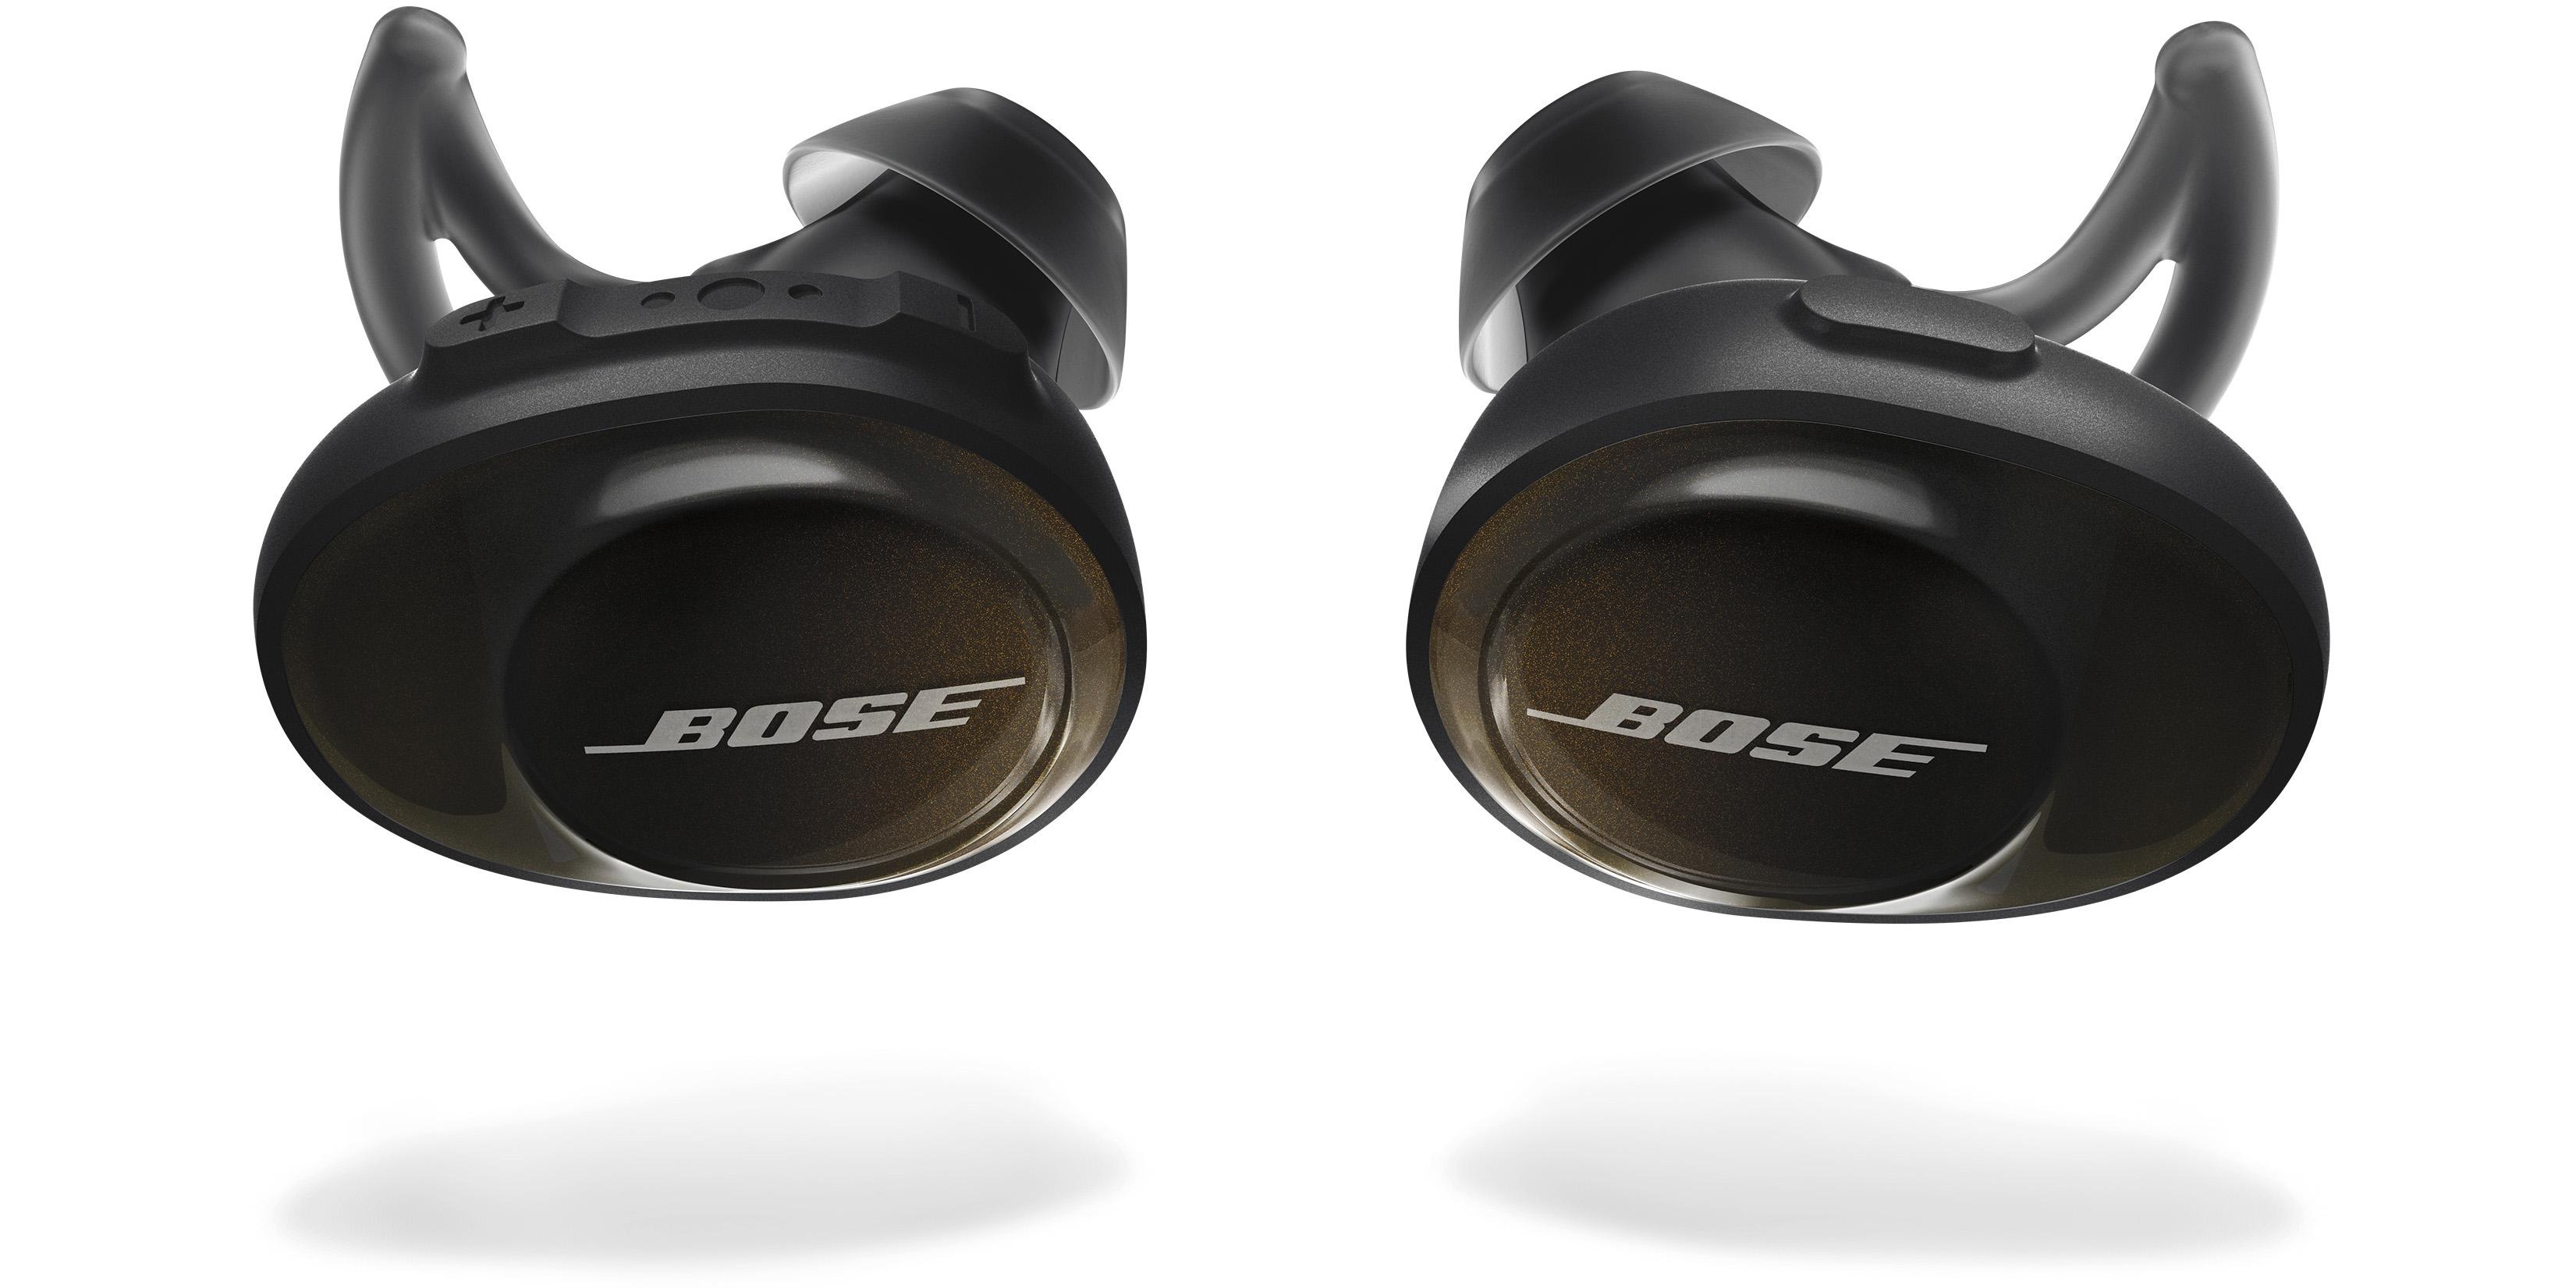 Bose refurb headphones and speakers from $81: SoundSport Free, QuietComfort 20, more